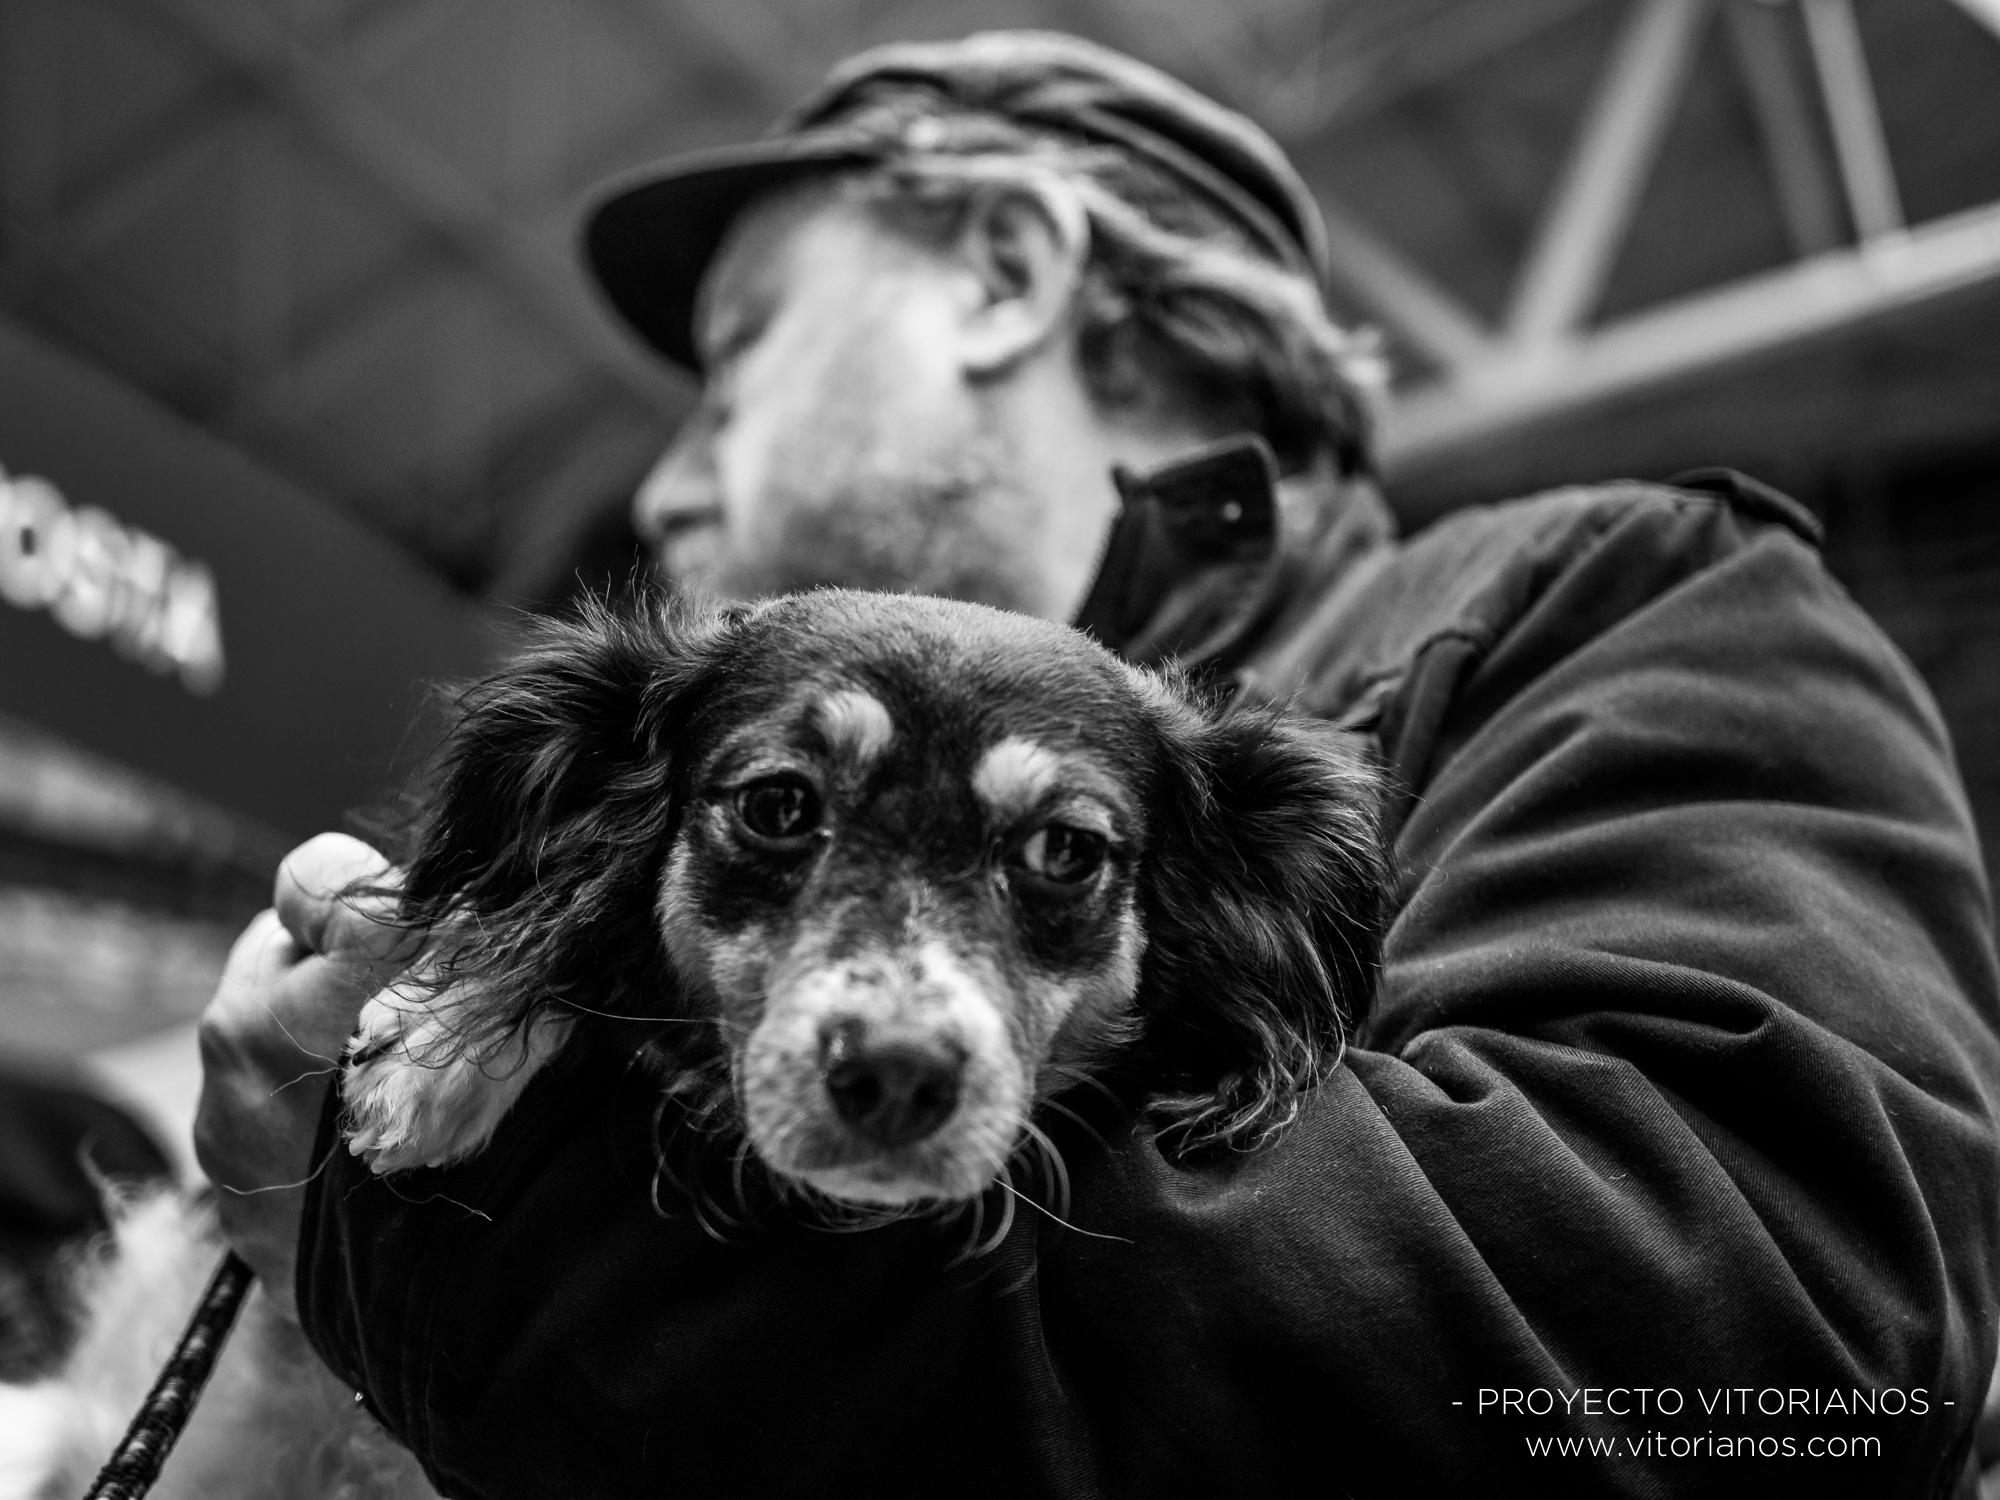 Perro en brazos - Foto: Juanan Pérez de Cárcamo